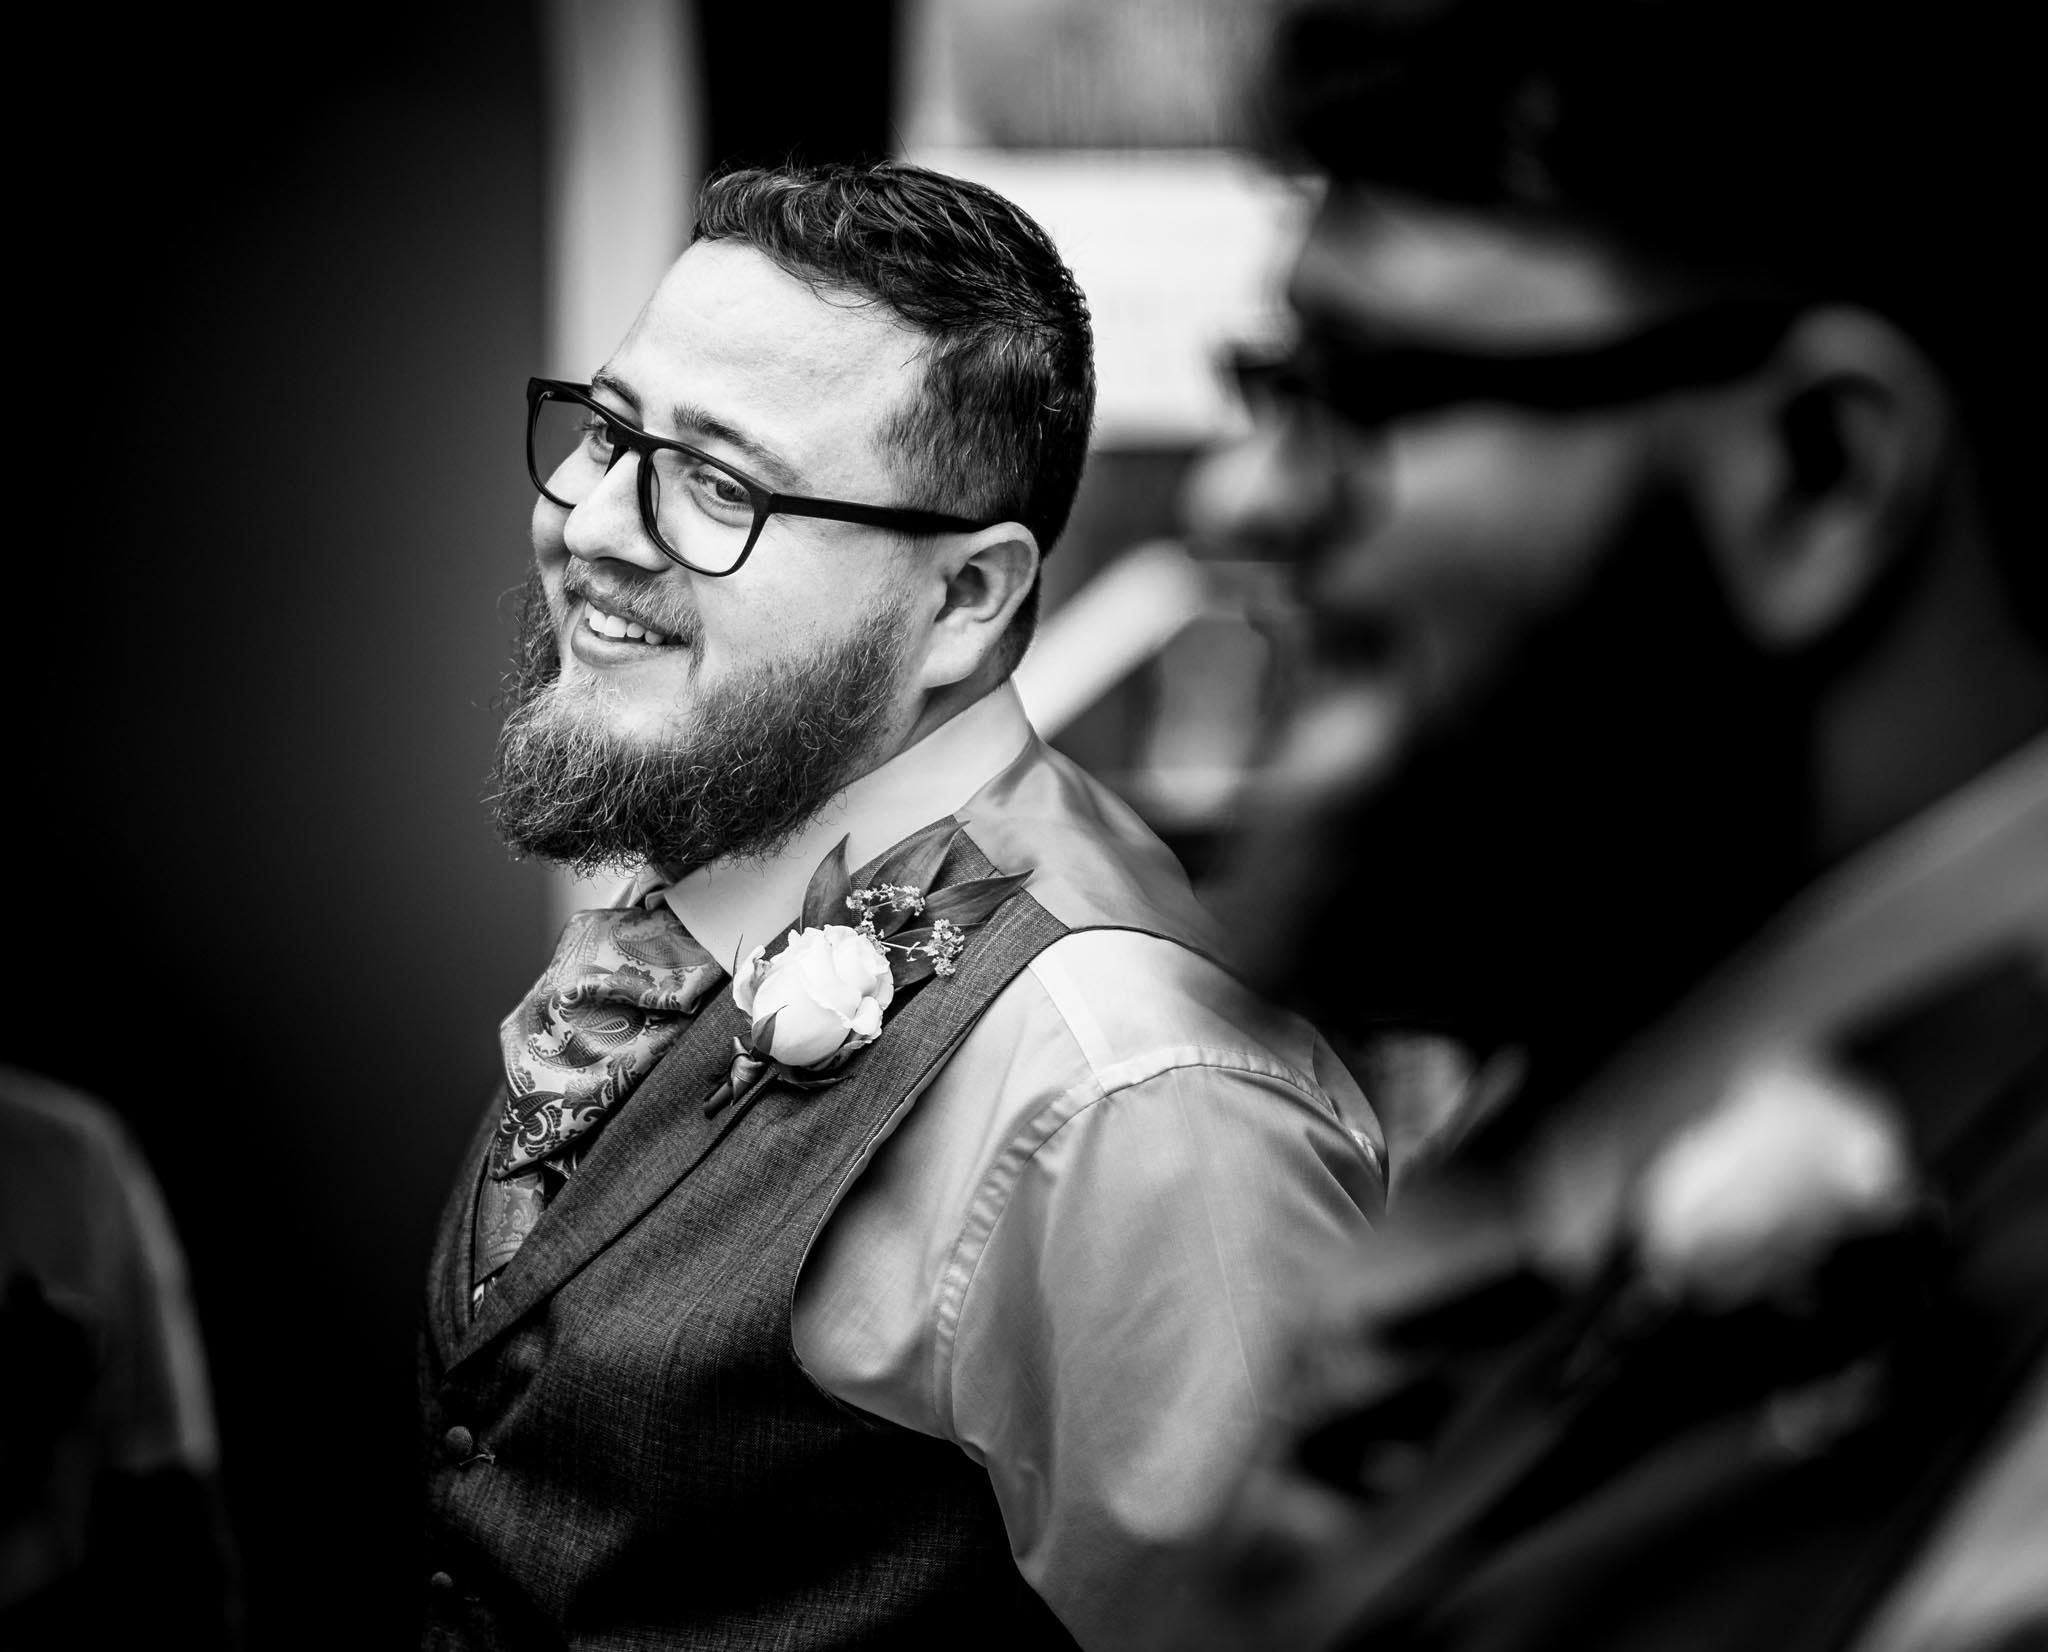 254-Arrivals-Luke-Yasmin-The-Rayleigh-Club-Wedding-Photography.jpg